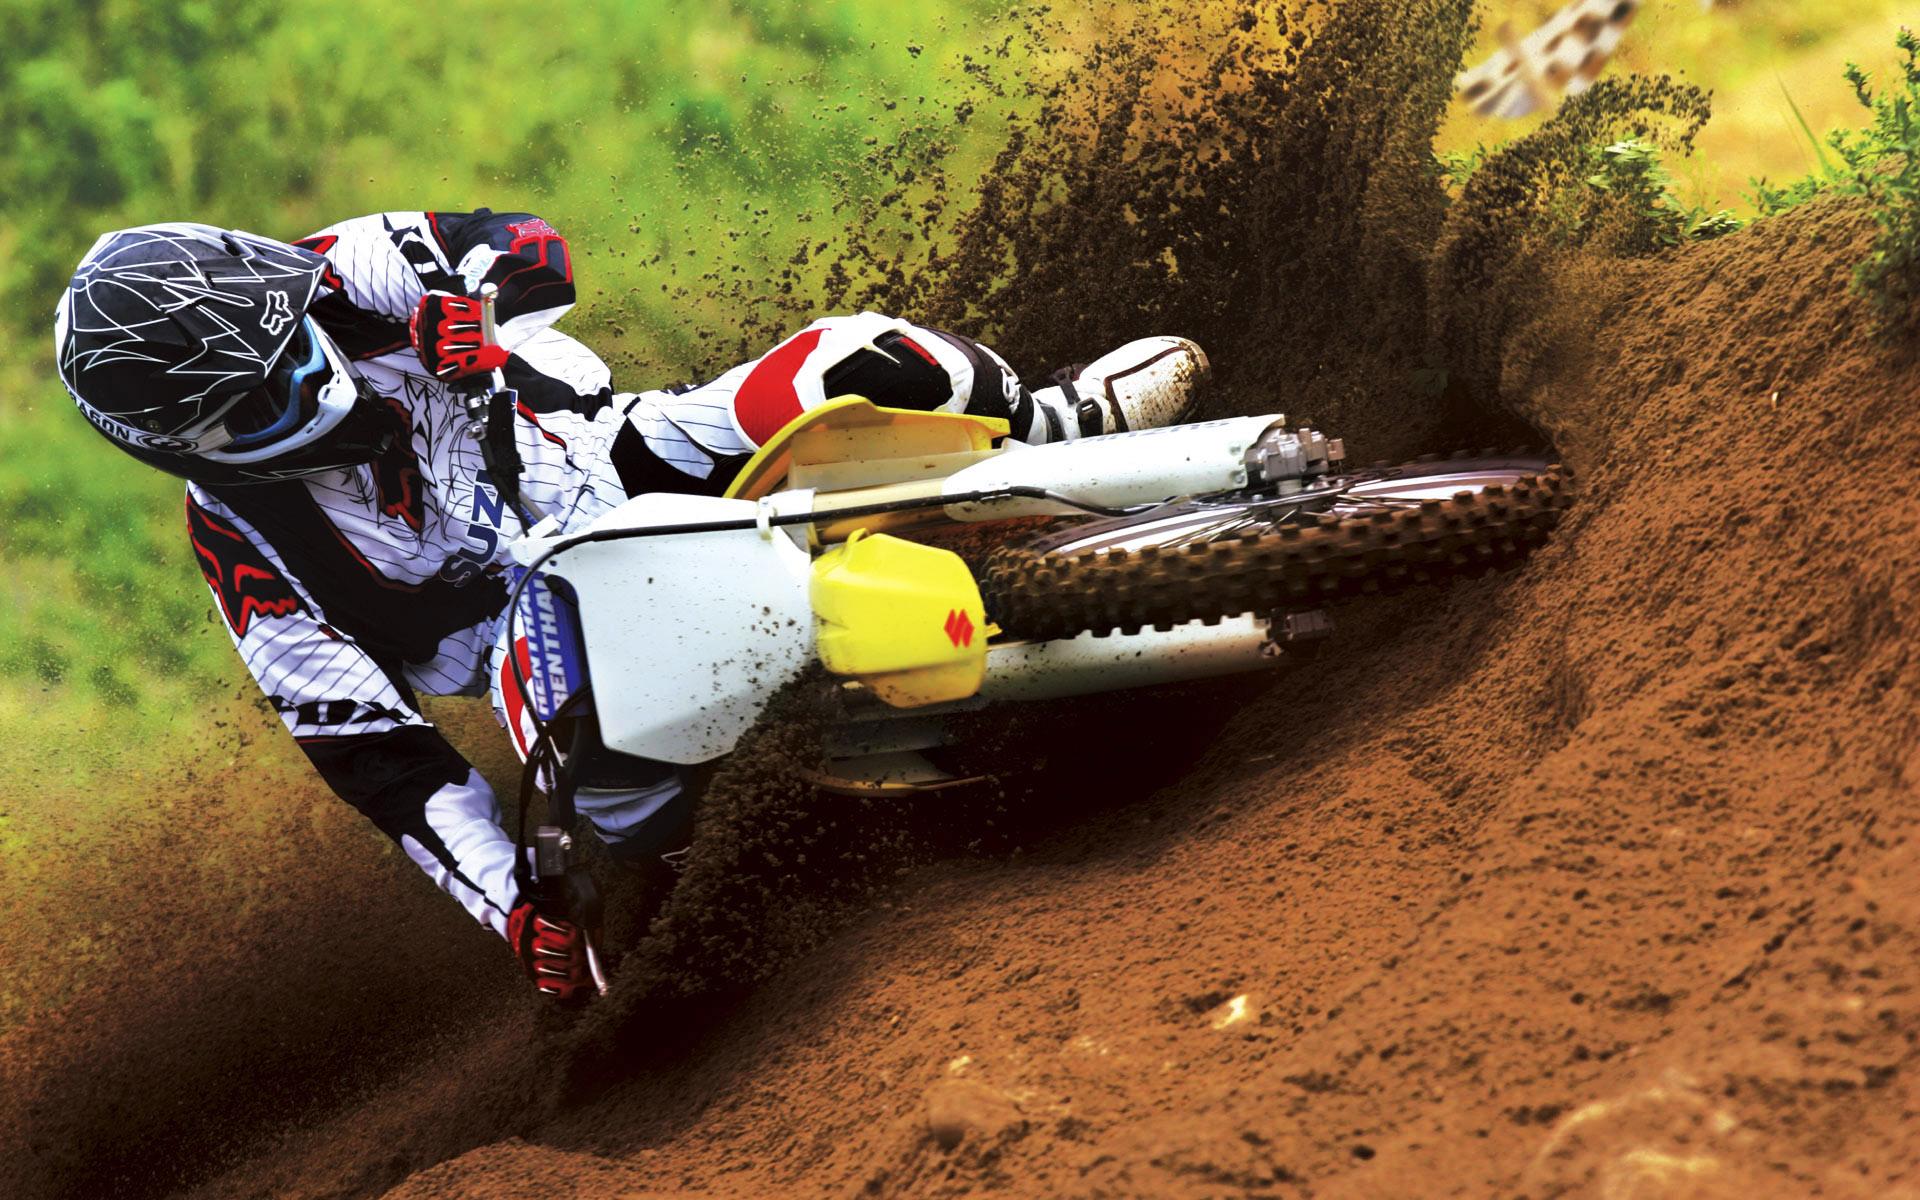 2010 World Celebrities Motocross Race In Mexico Journey